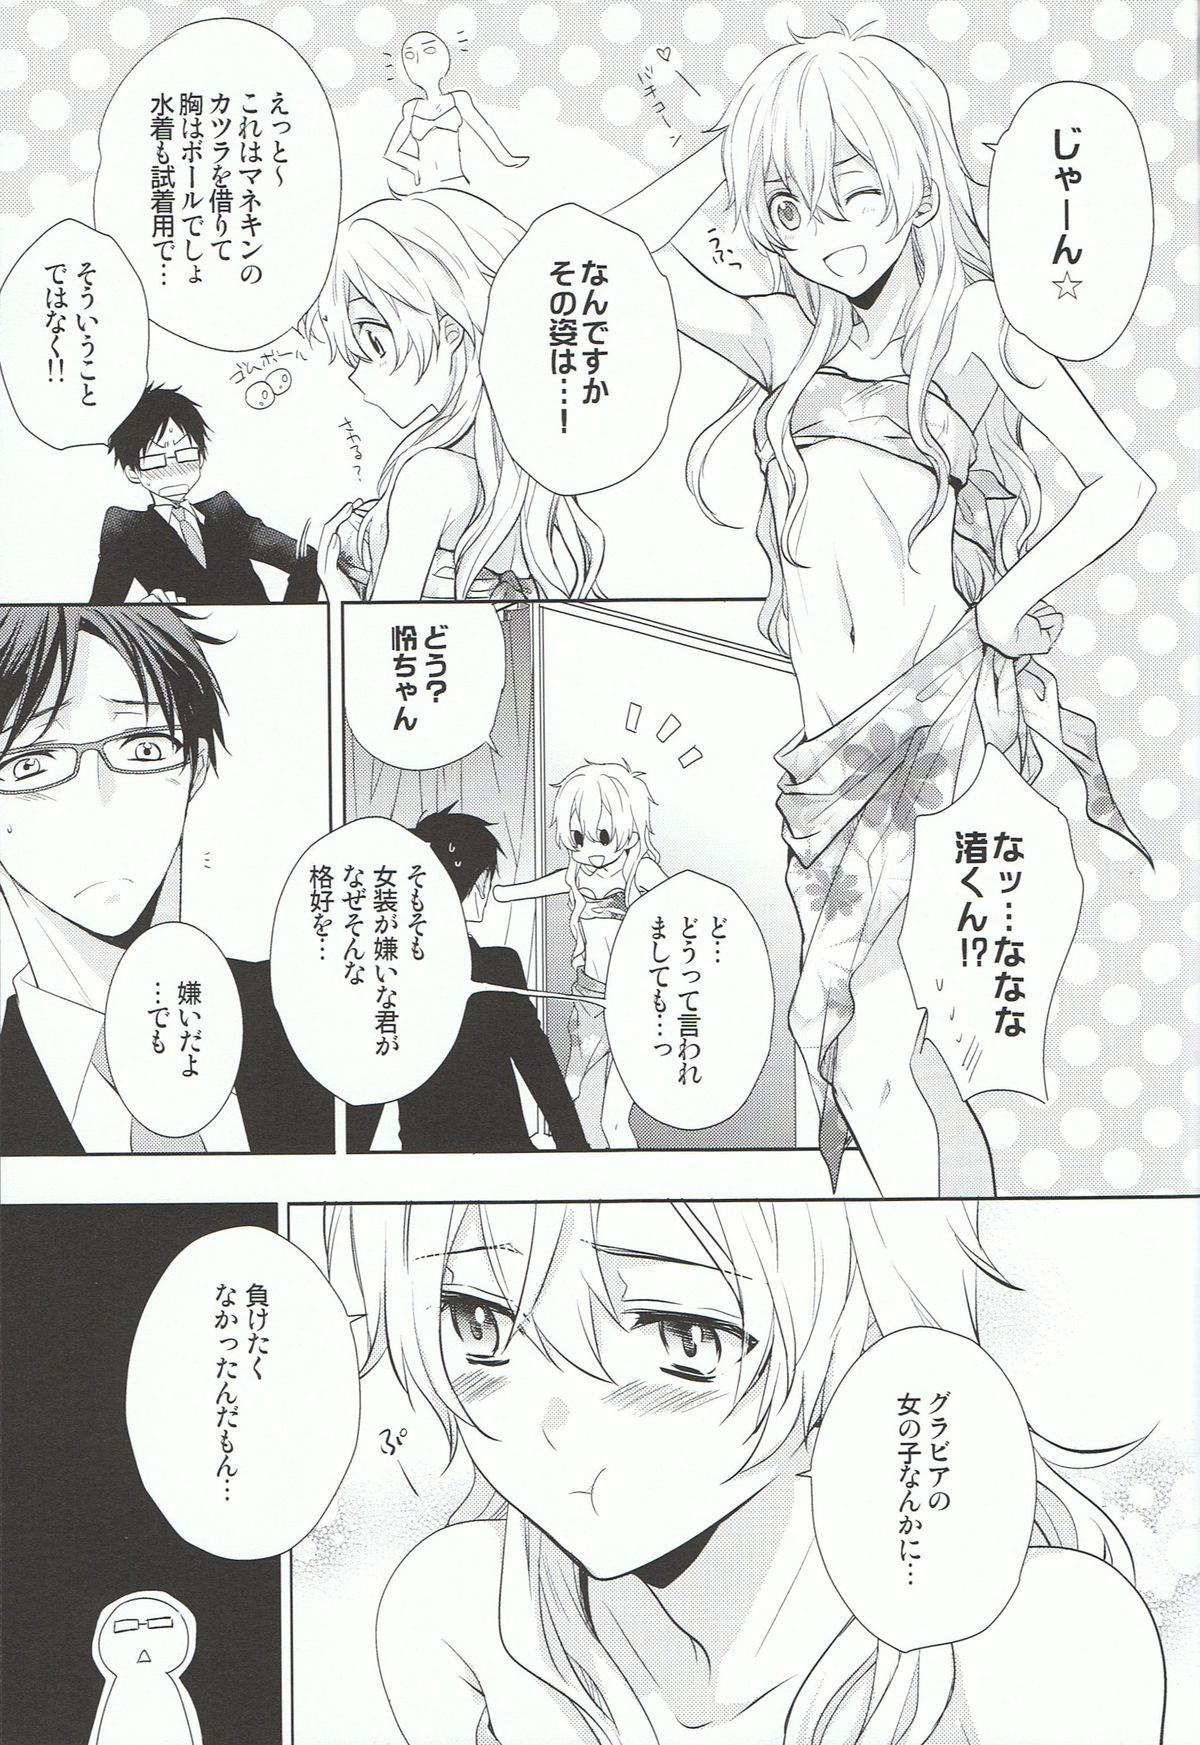 Nagisa-kun de ii deshou! 15